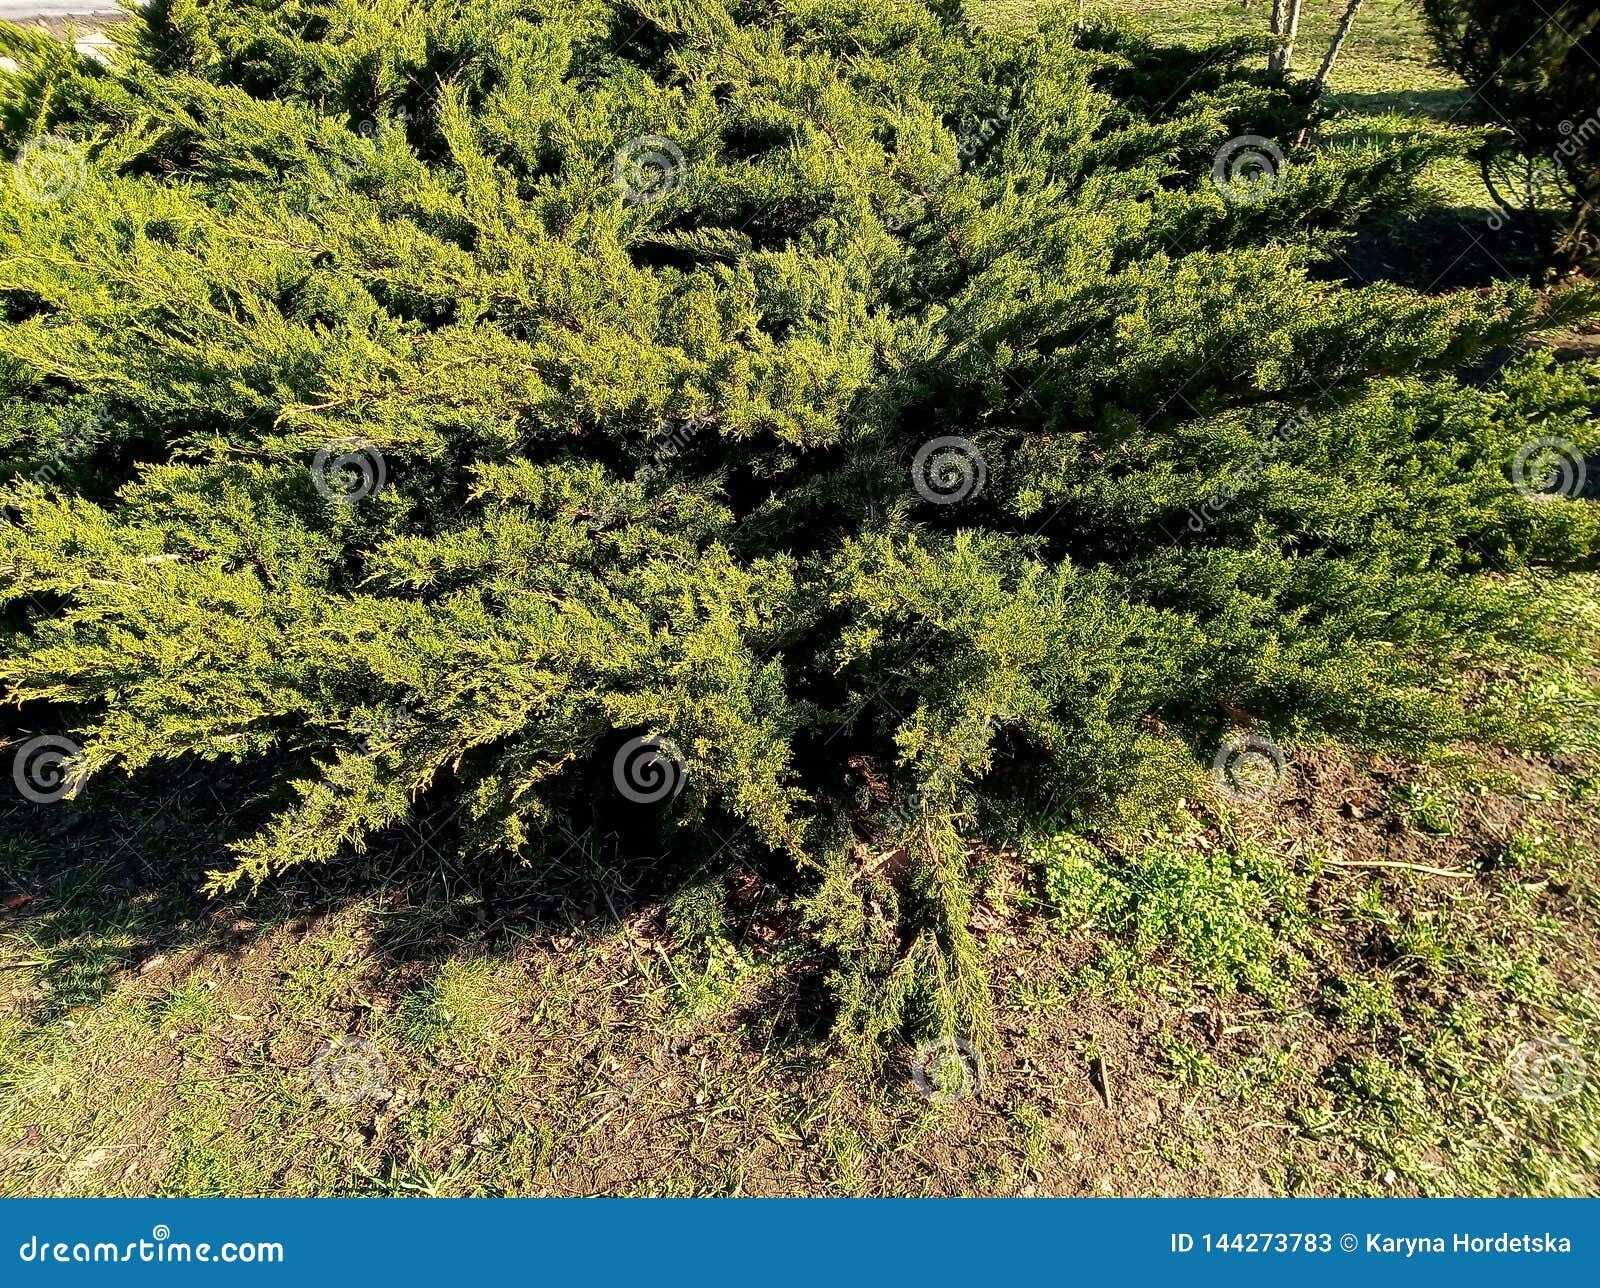 Huge green bush at sunny day in park